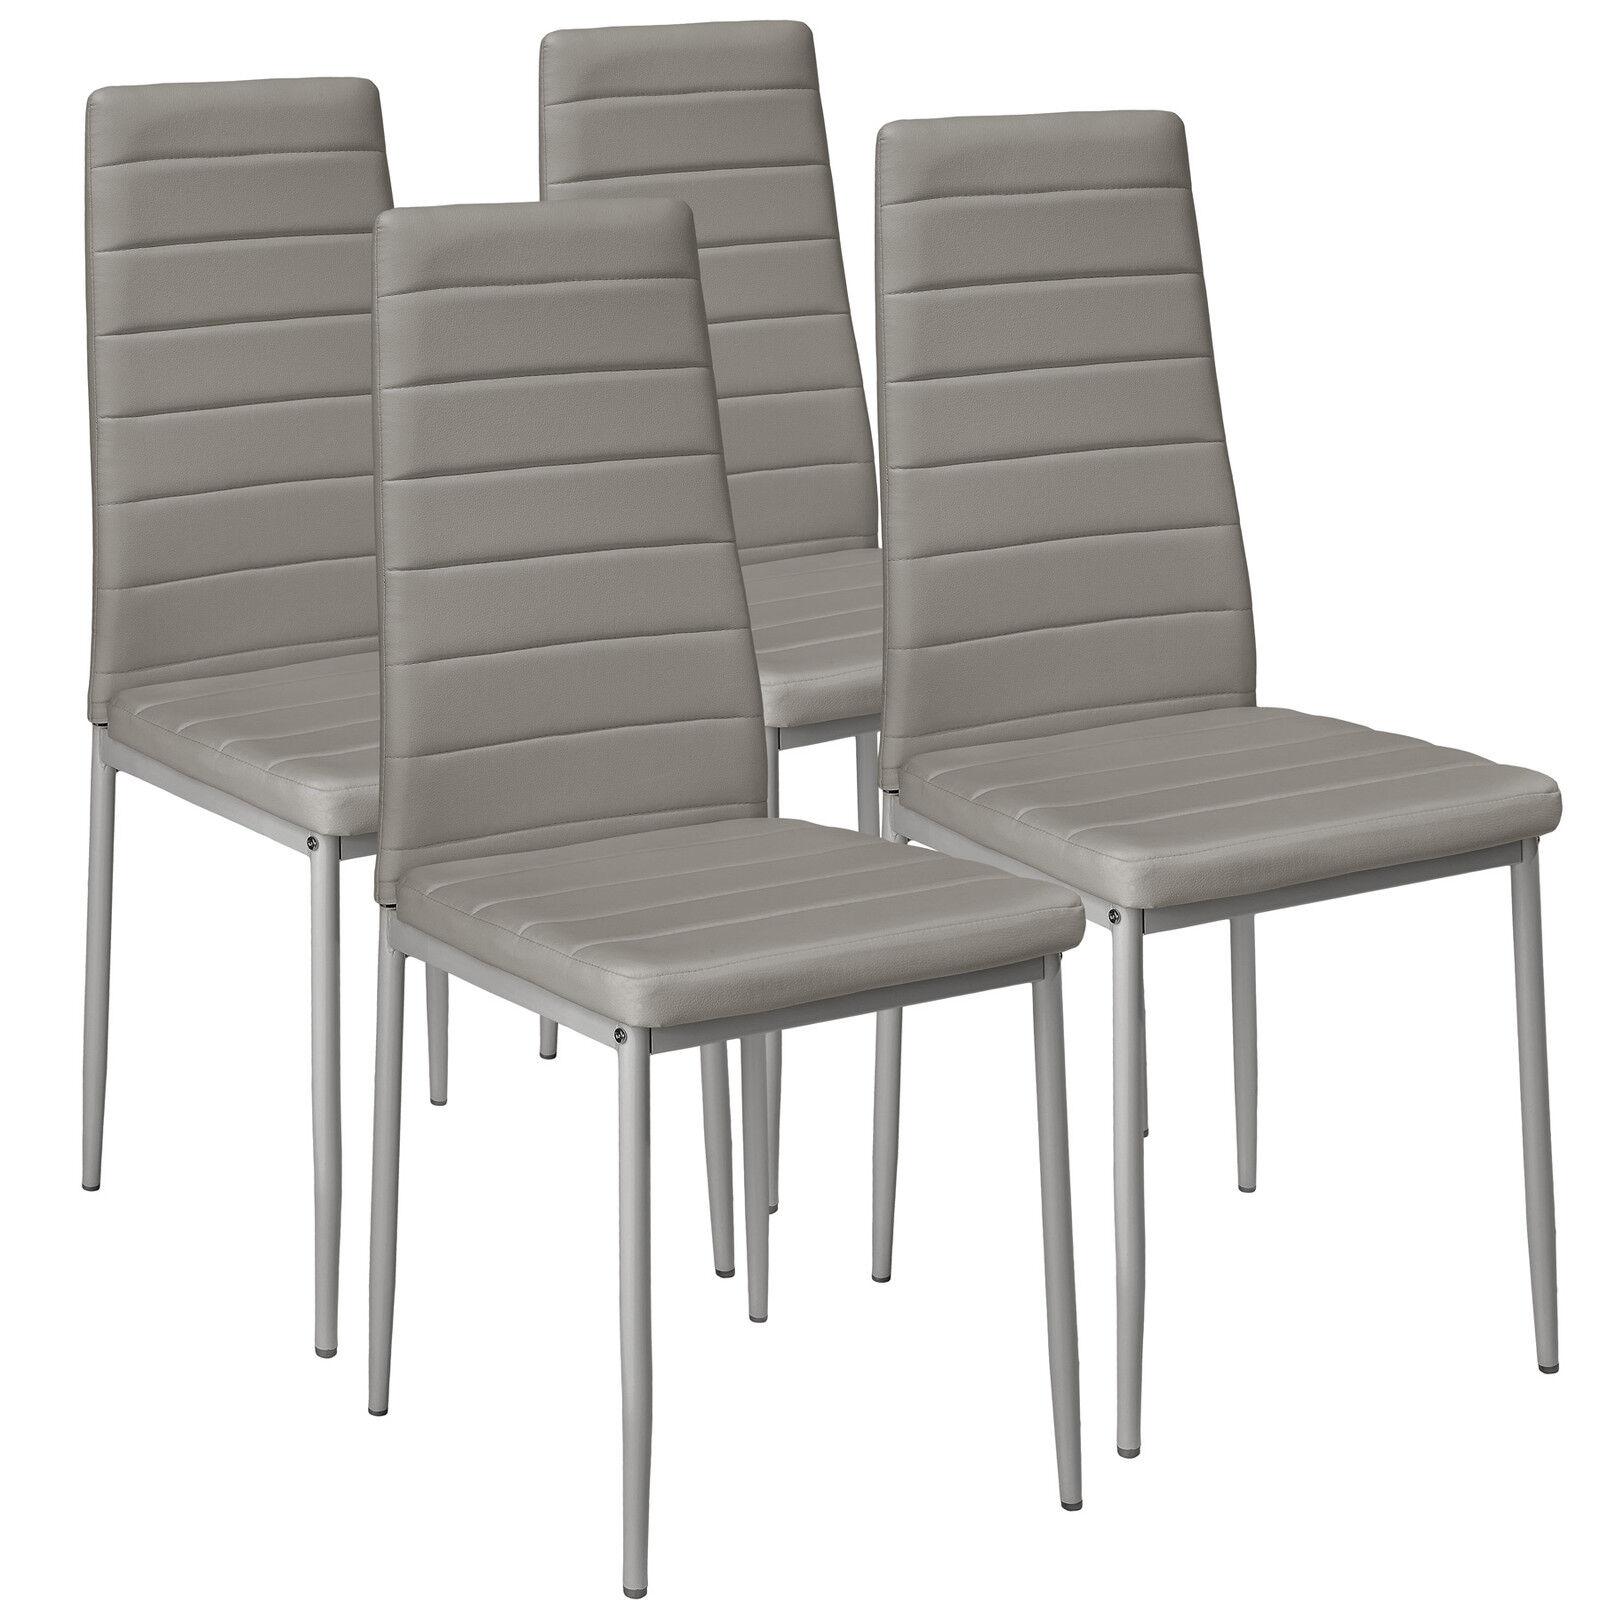 4x Sillas de comedor Juego elegantes sillas de diseño modernas cocina gris...